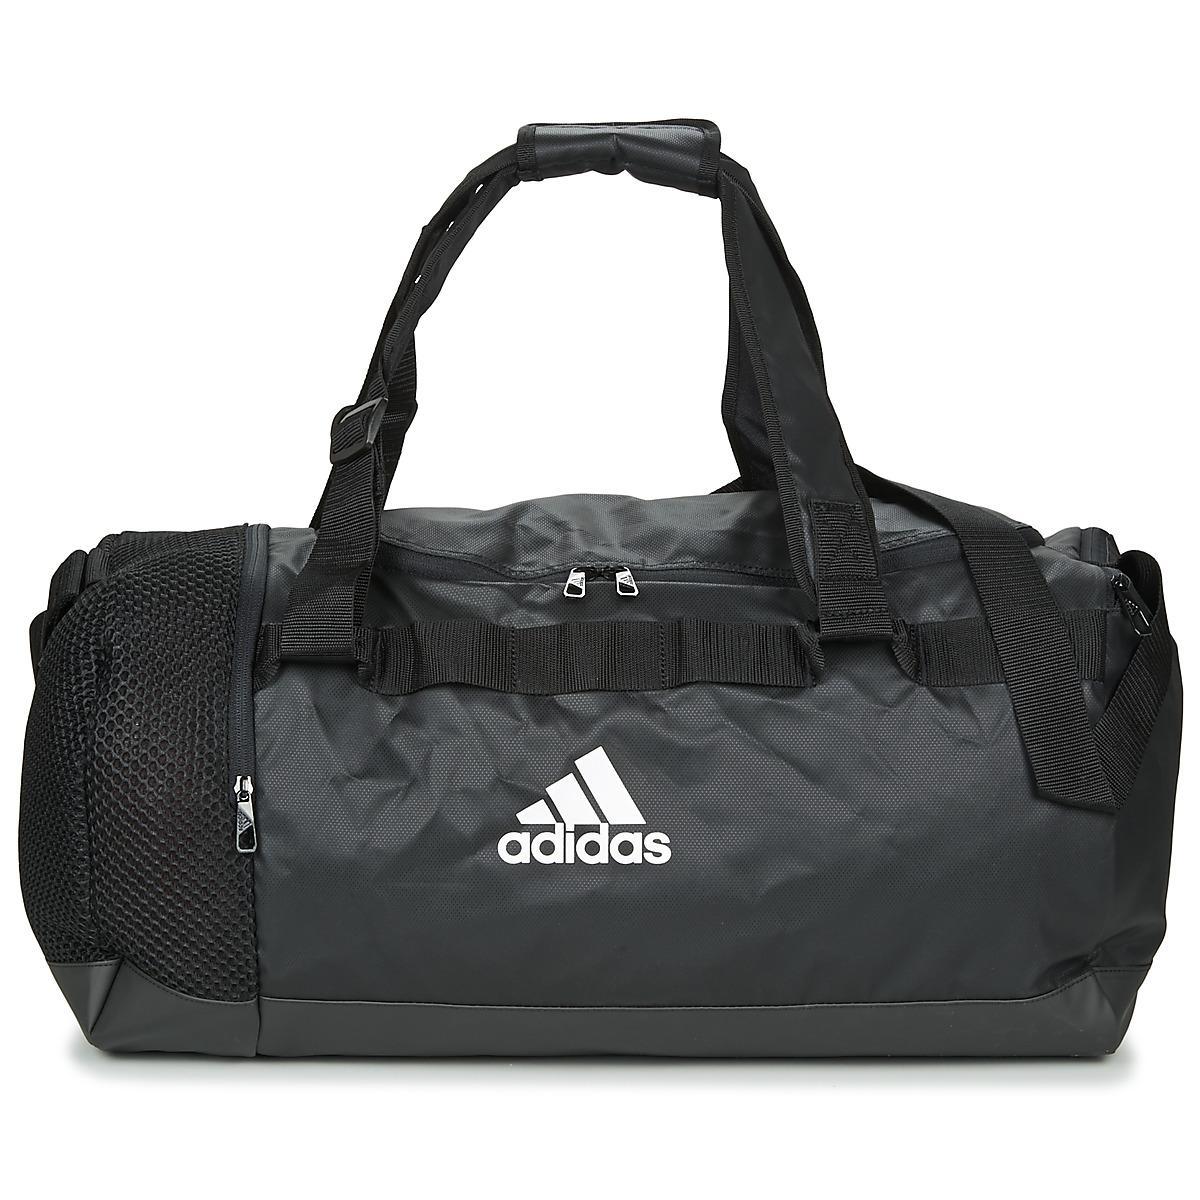 a1accc4a73e4 adidas Tr Cvrt Duf M Sports Bag in Black for Men - Lyst